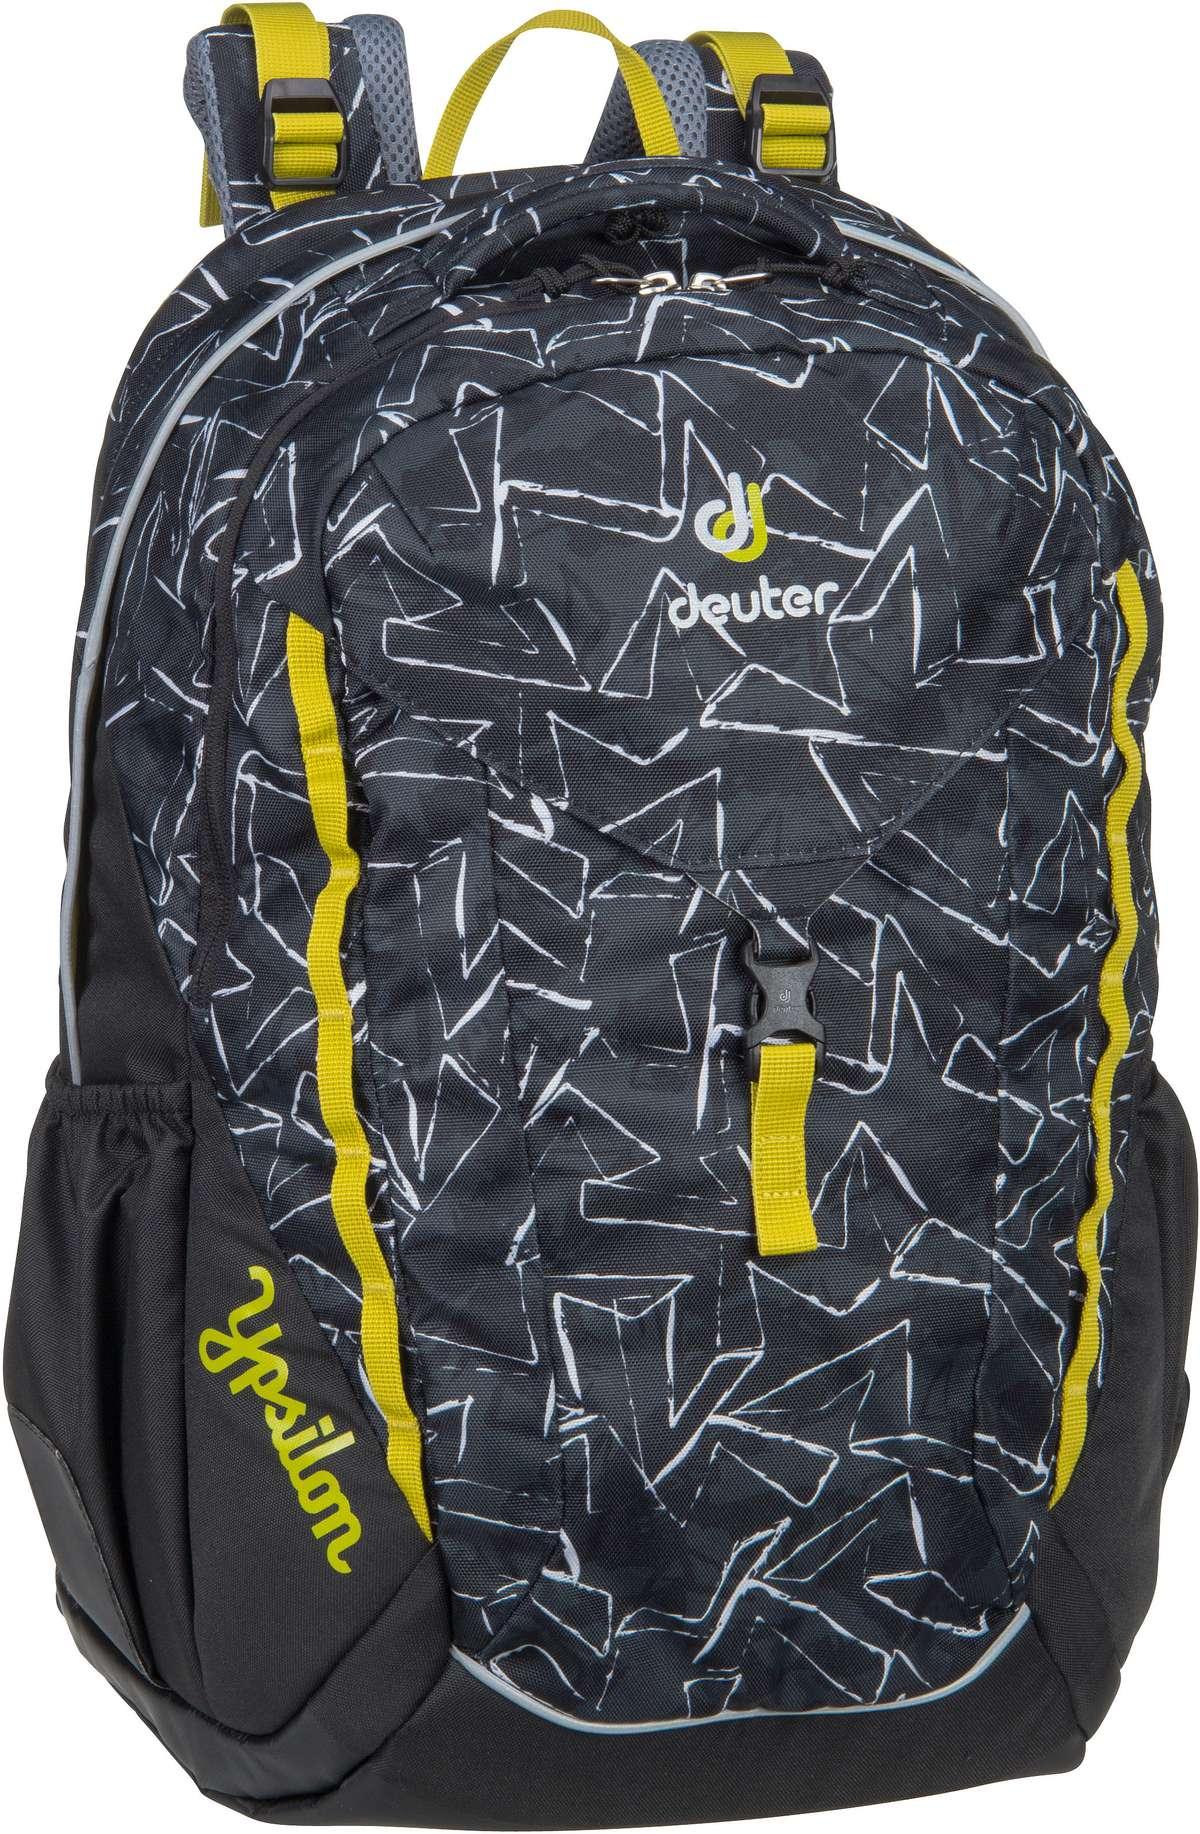 Rucksack / Daypack Ypsilon Black Dart (28 Liter)